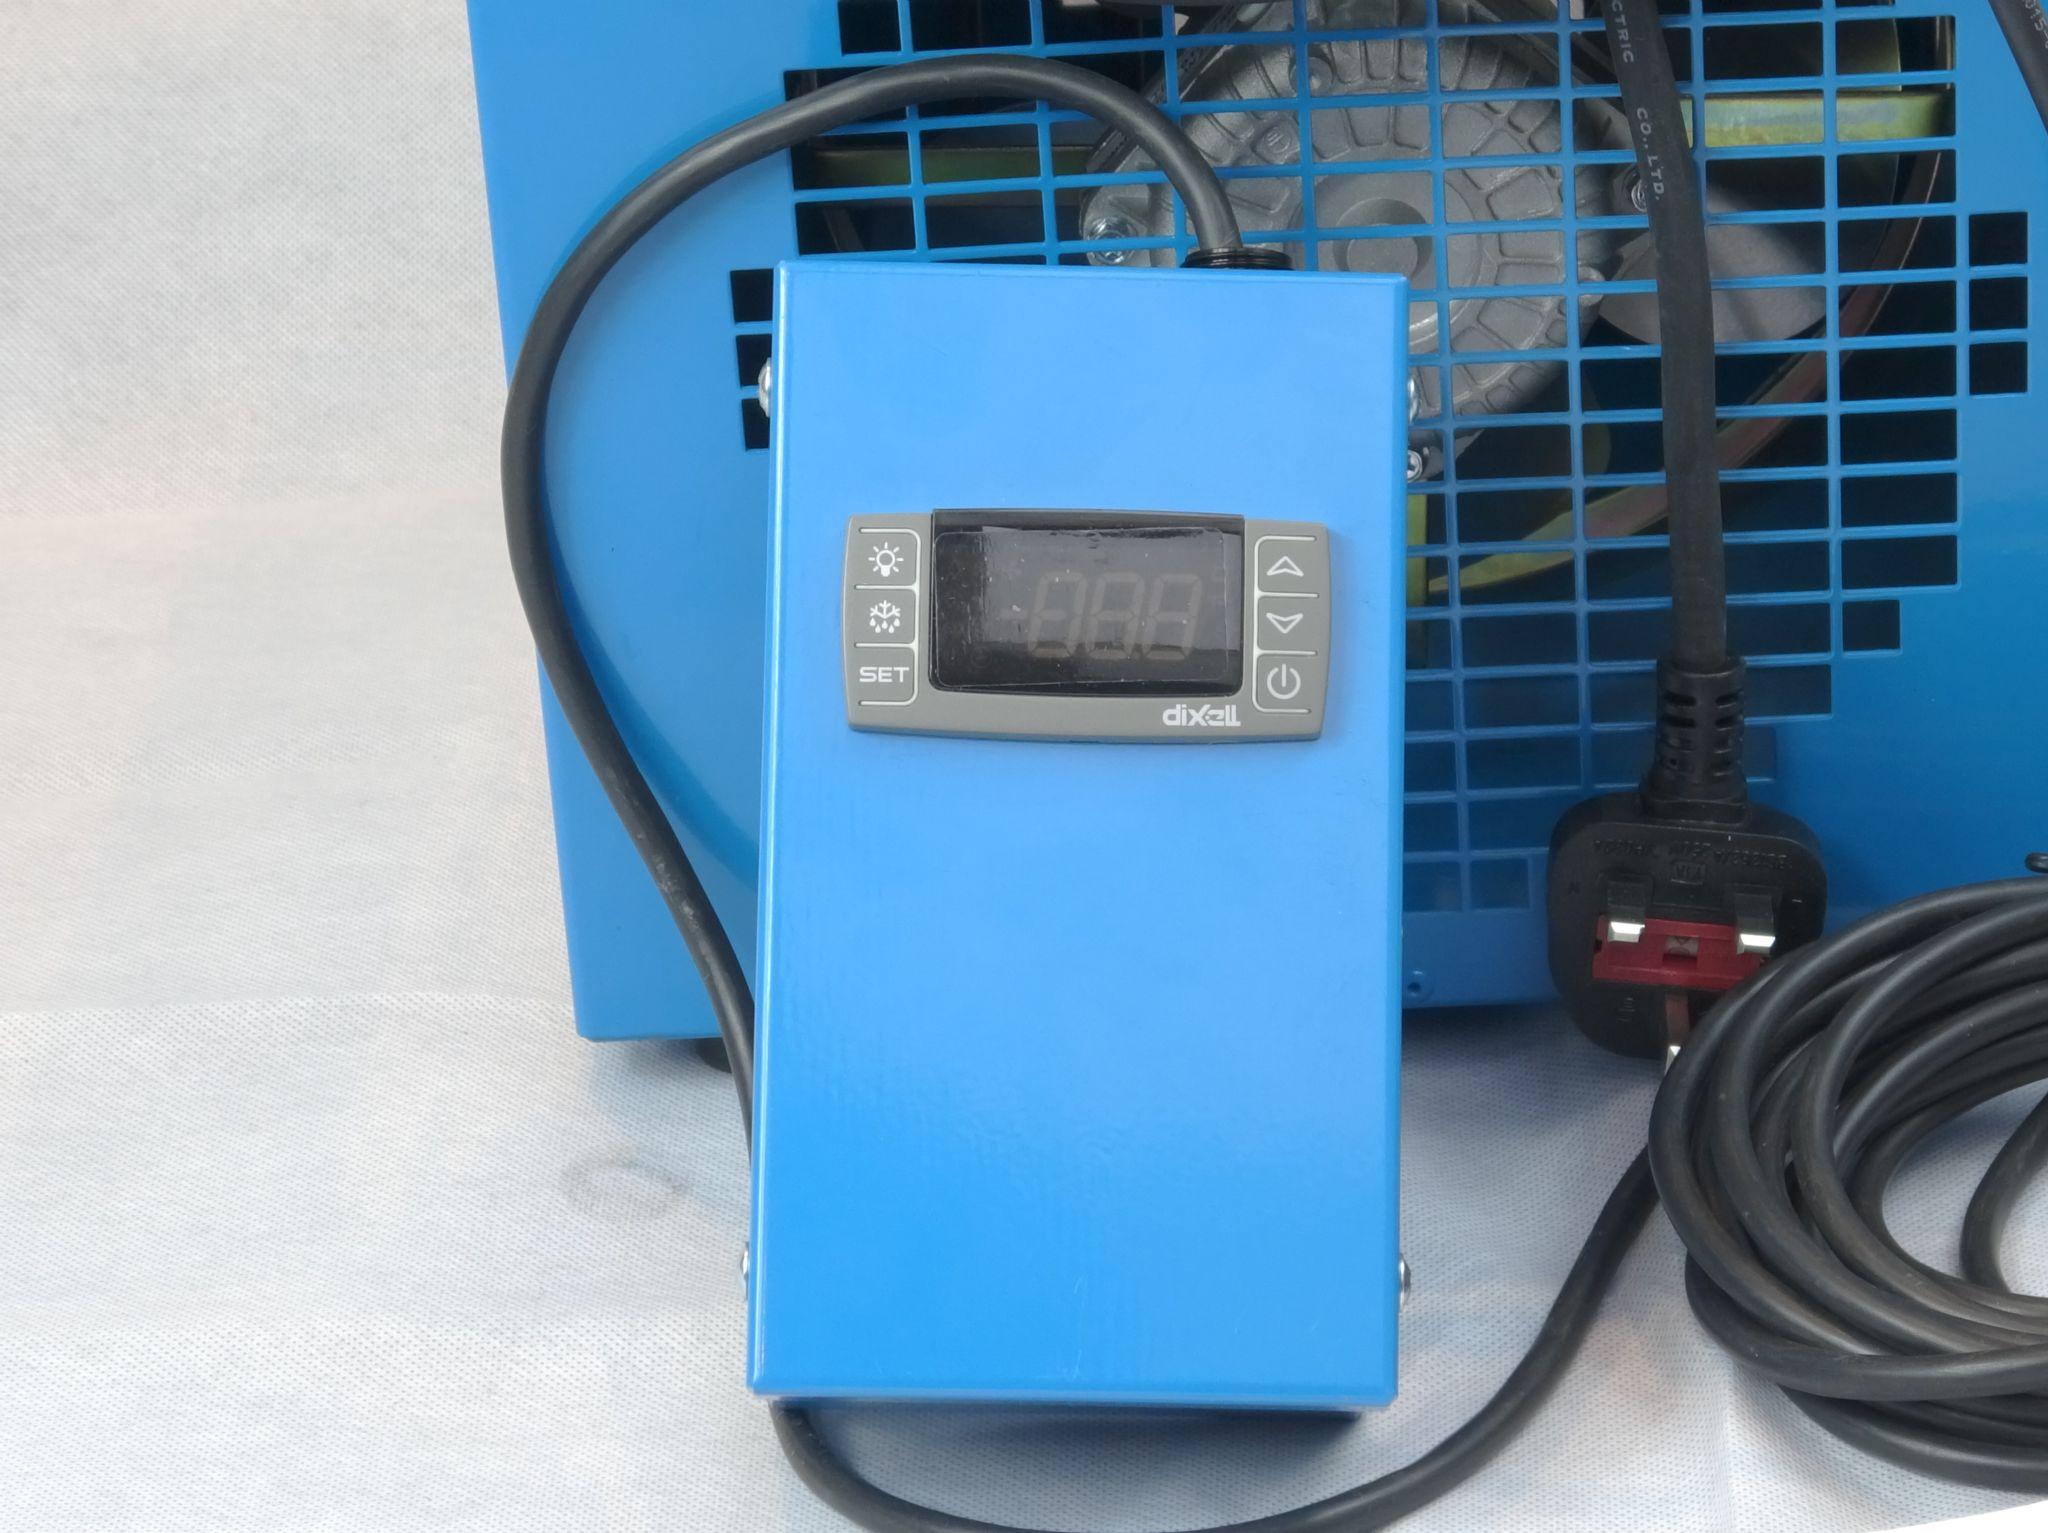 High Temp Electric Heater Ff3t 13 3kw 12000btu With